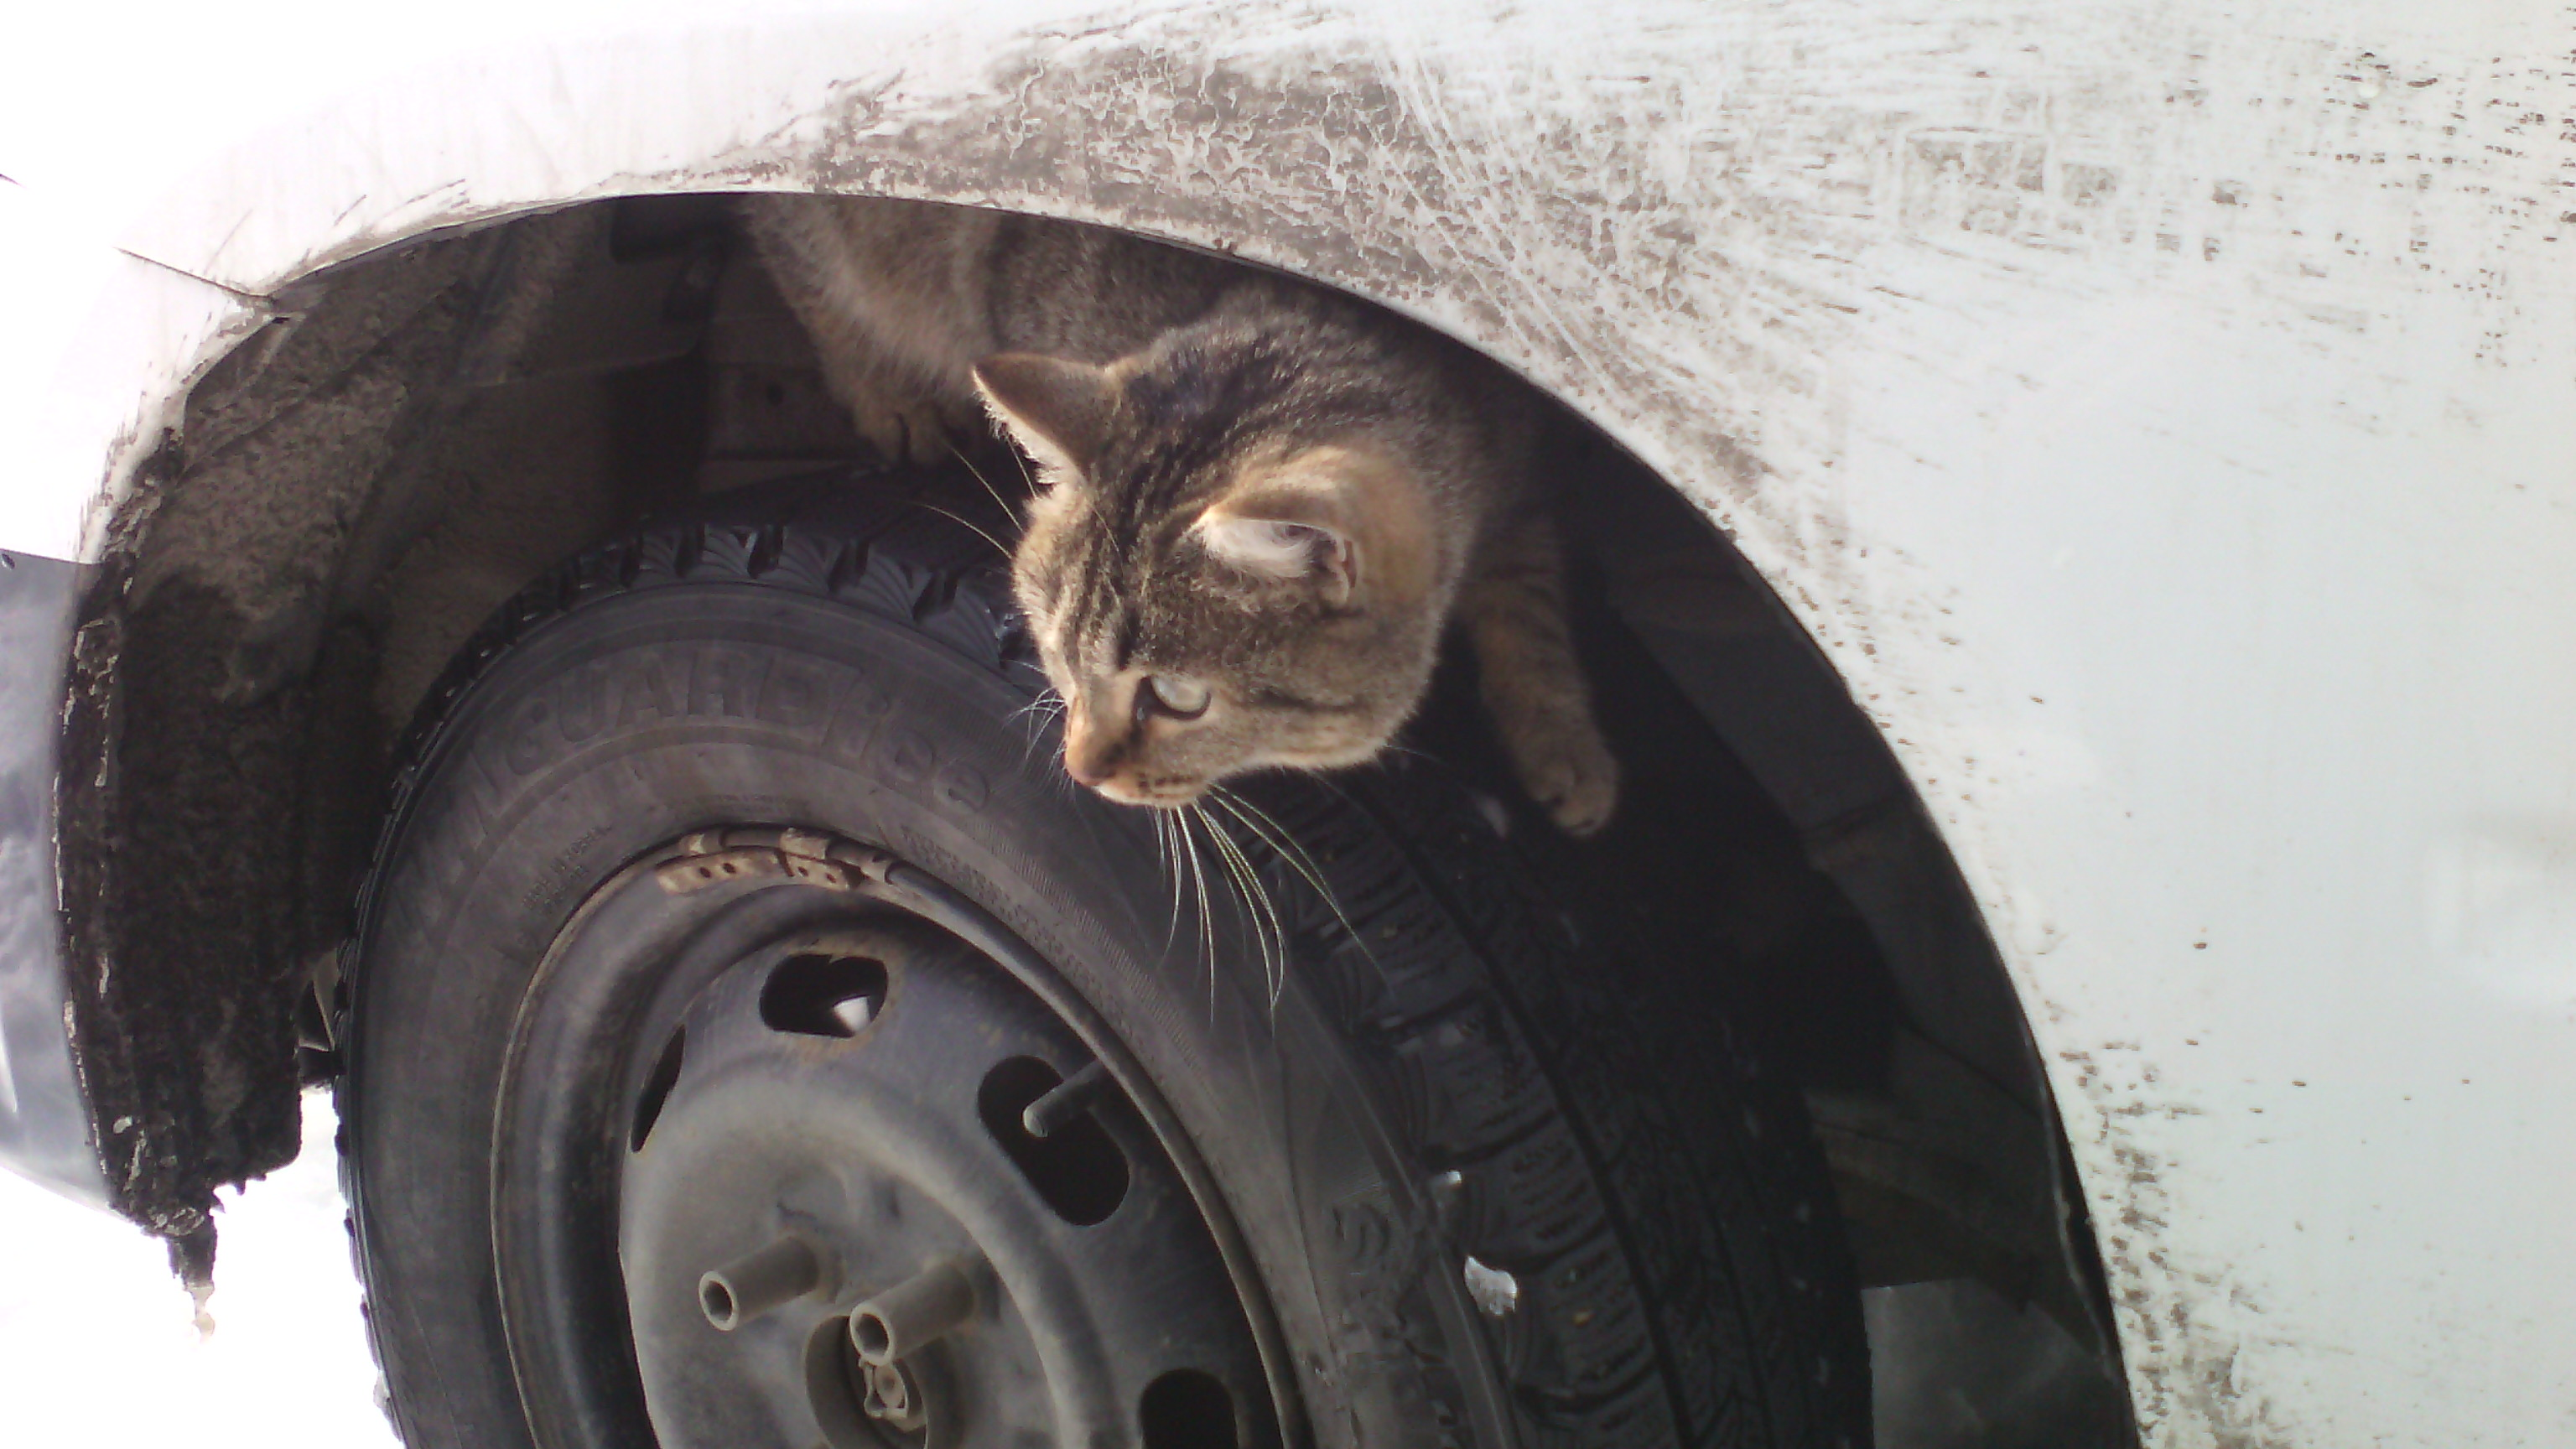 потеряли кота поищите его на моих колесах